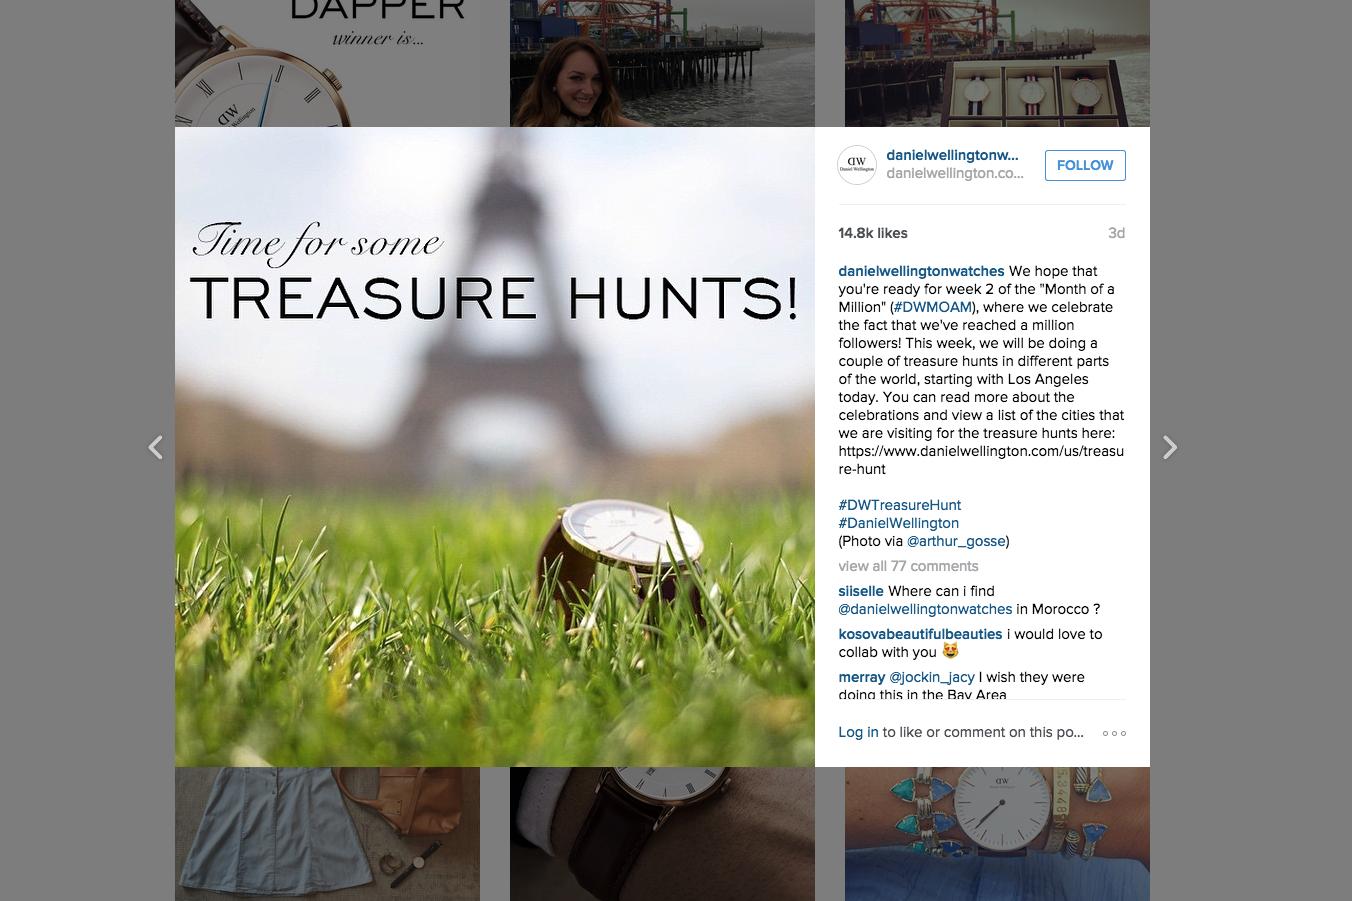 Daniel Wellington Instagram Treasure Hunt